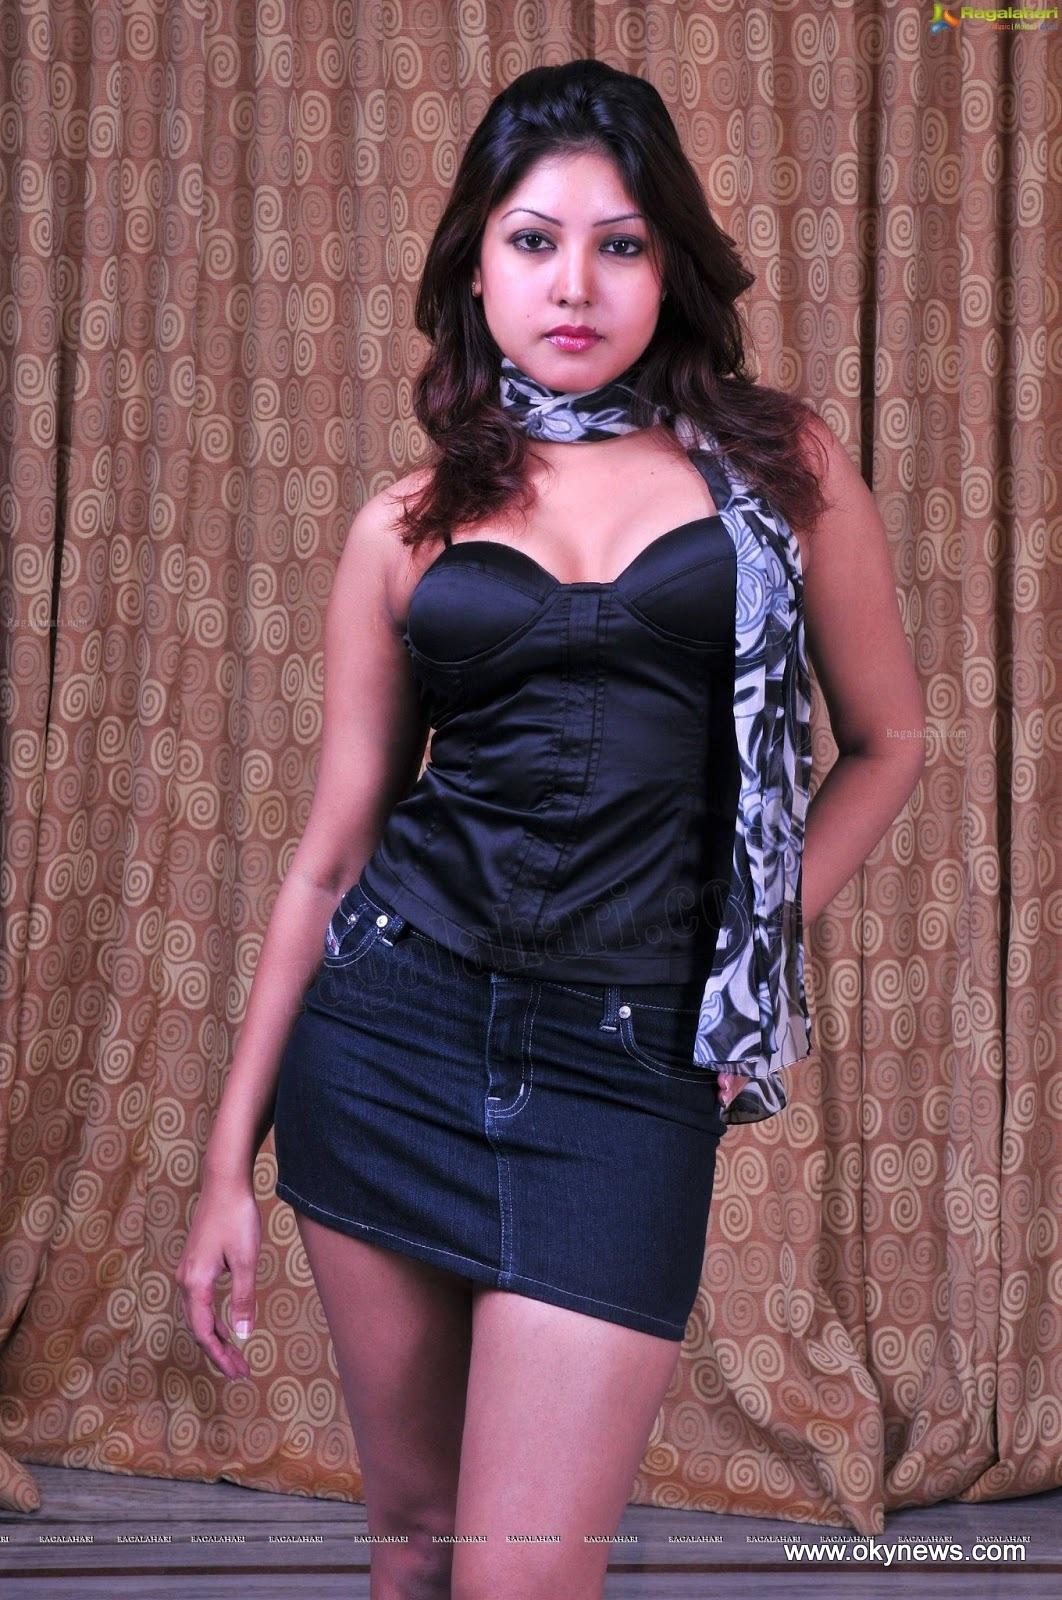 Komal Jha Latest Hot Photoshoot Stills#1 13 images AcuPOgUQ